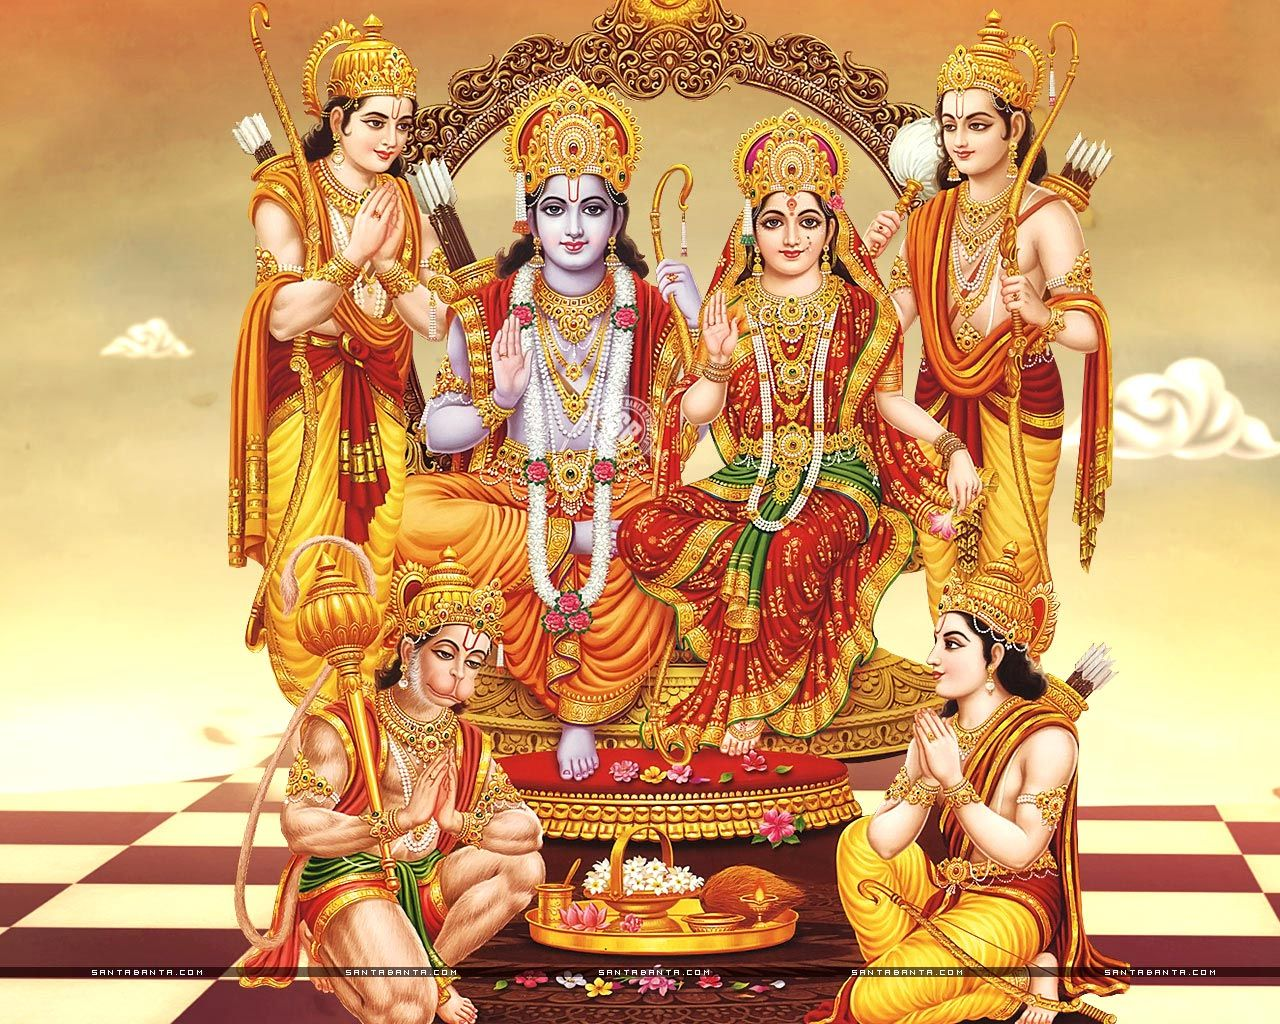 Wallpaper download karna hai - Ram Darbar Wallpapers Photos Free Download